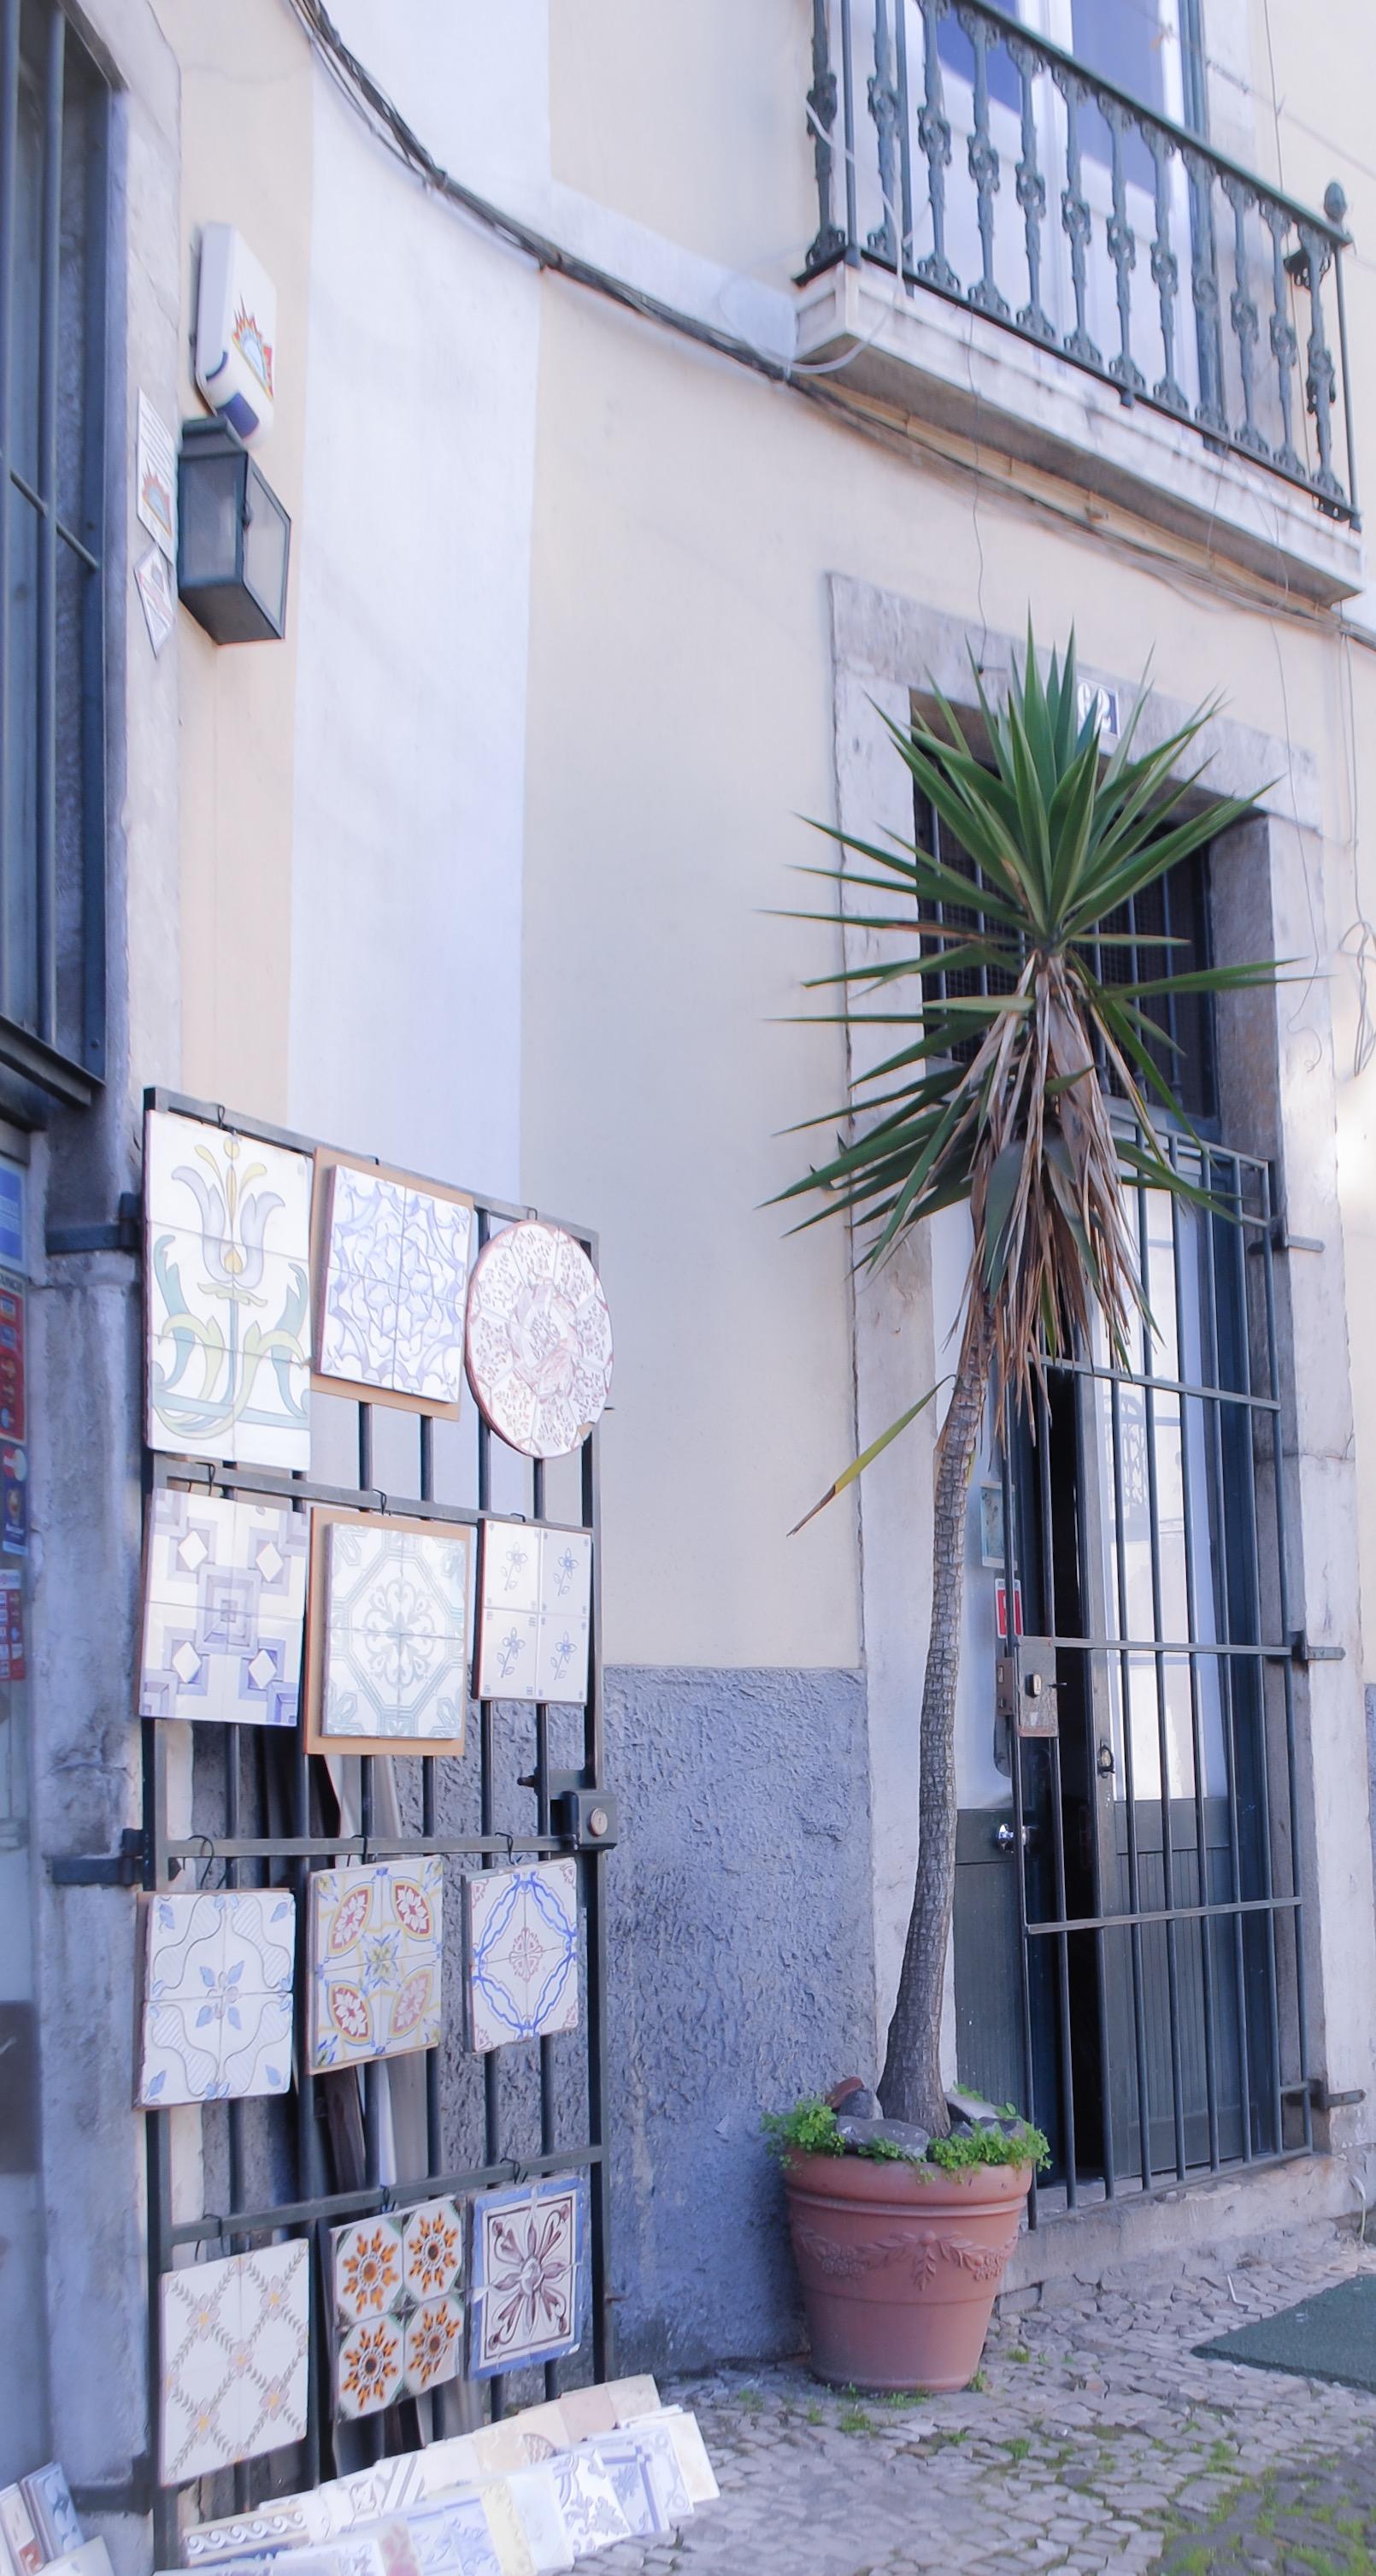 azulejos-latelierdelisa-voyage-lisbonne